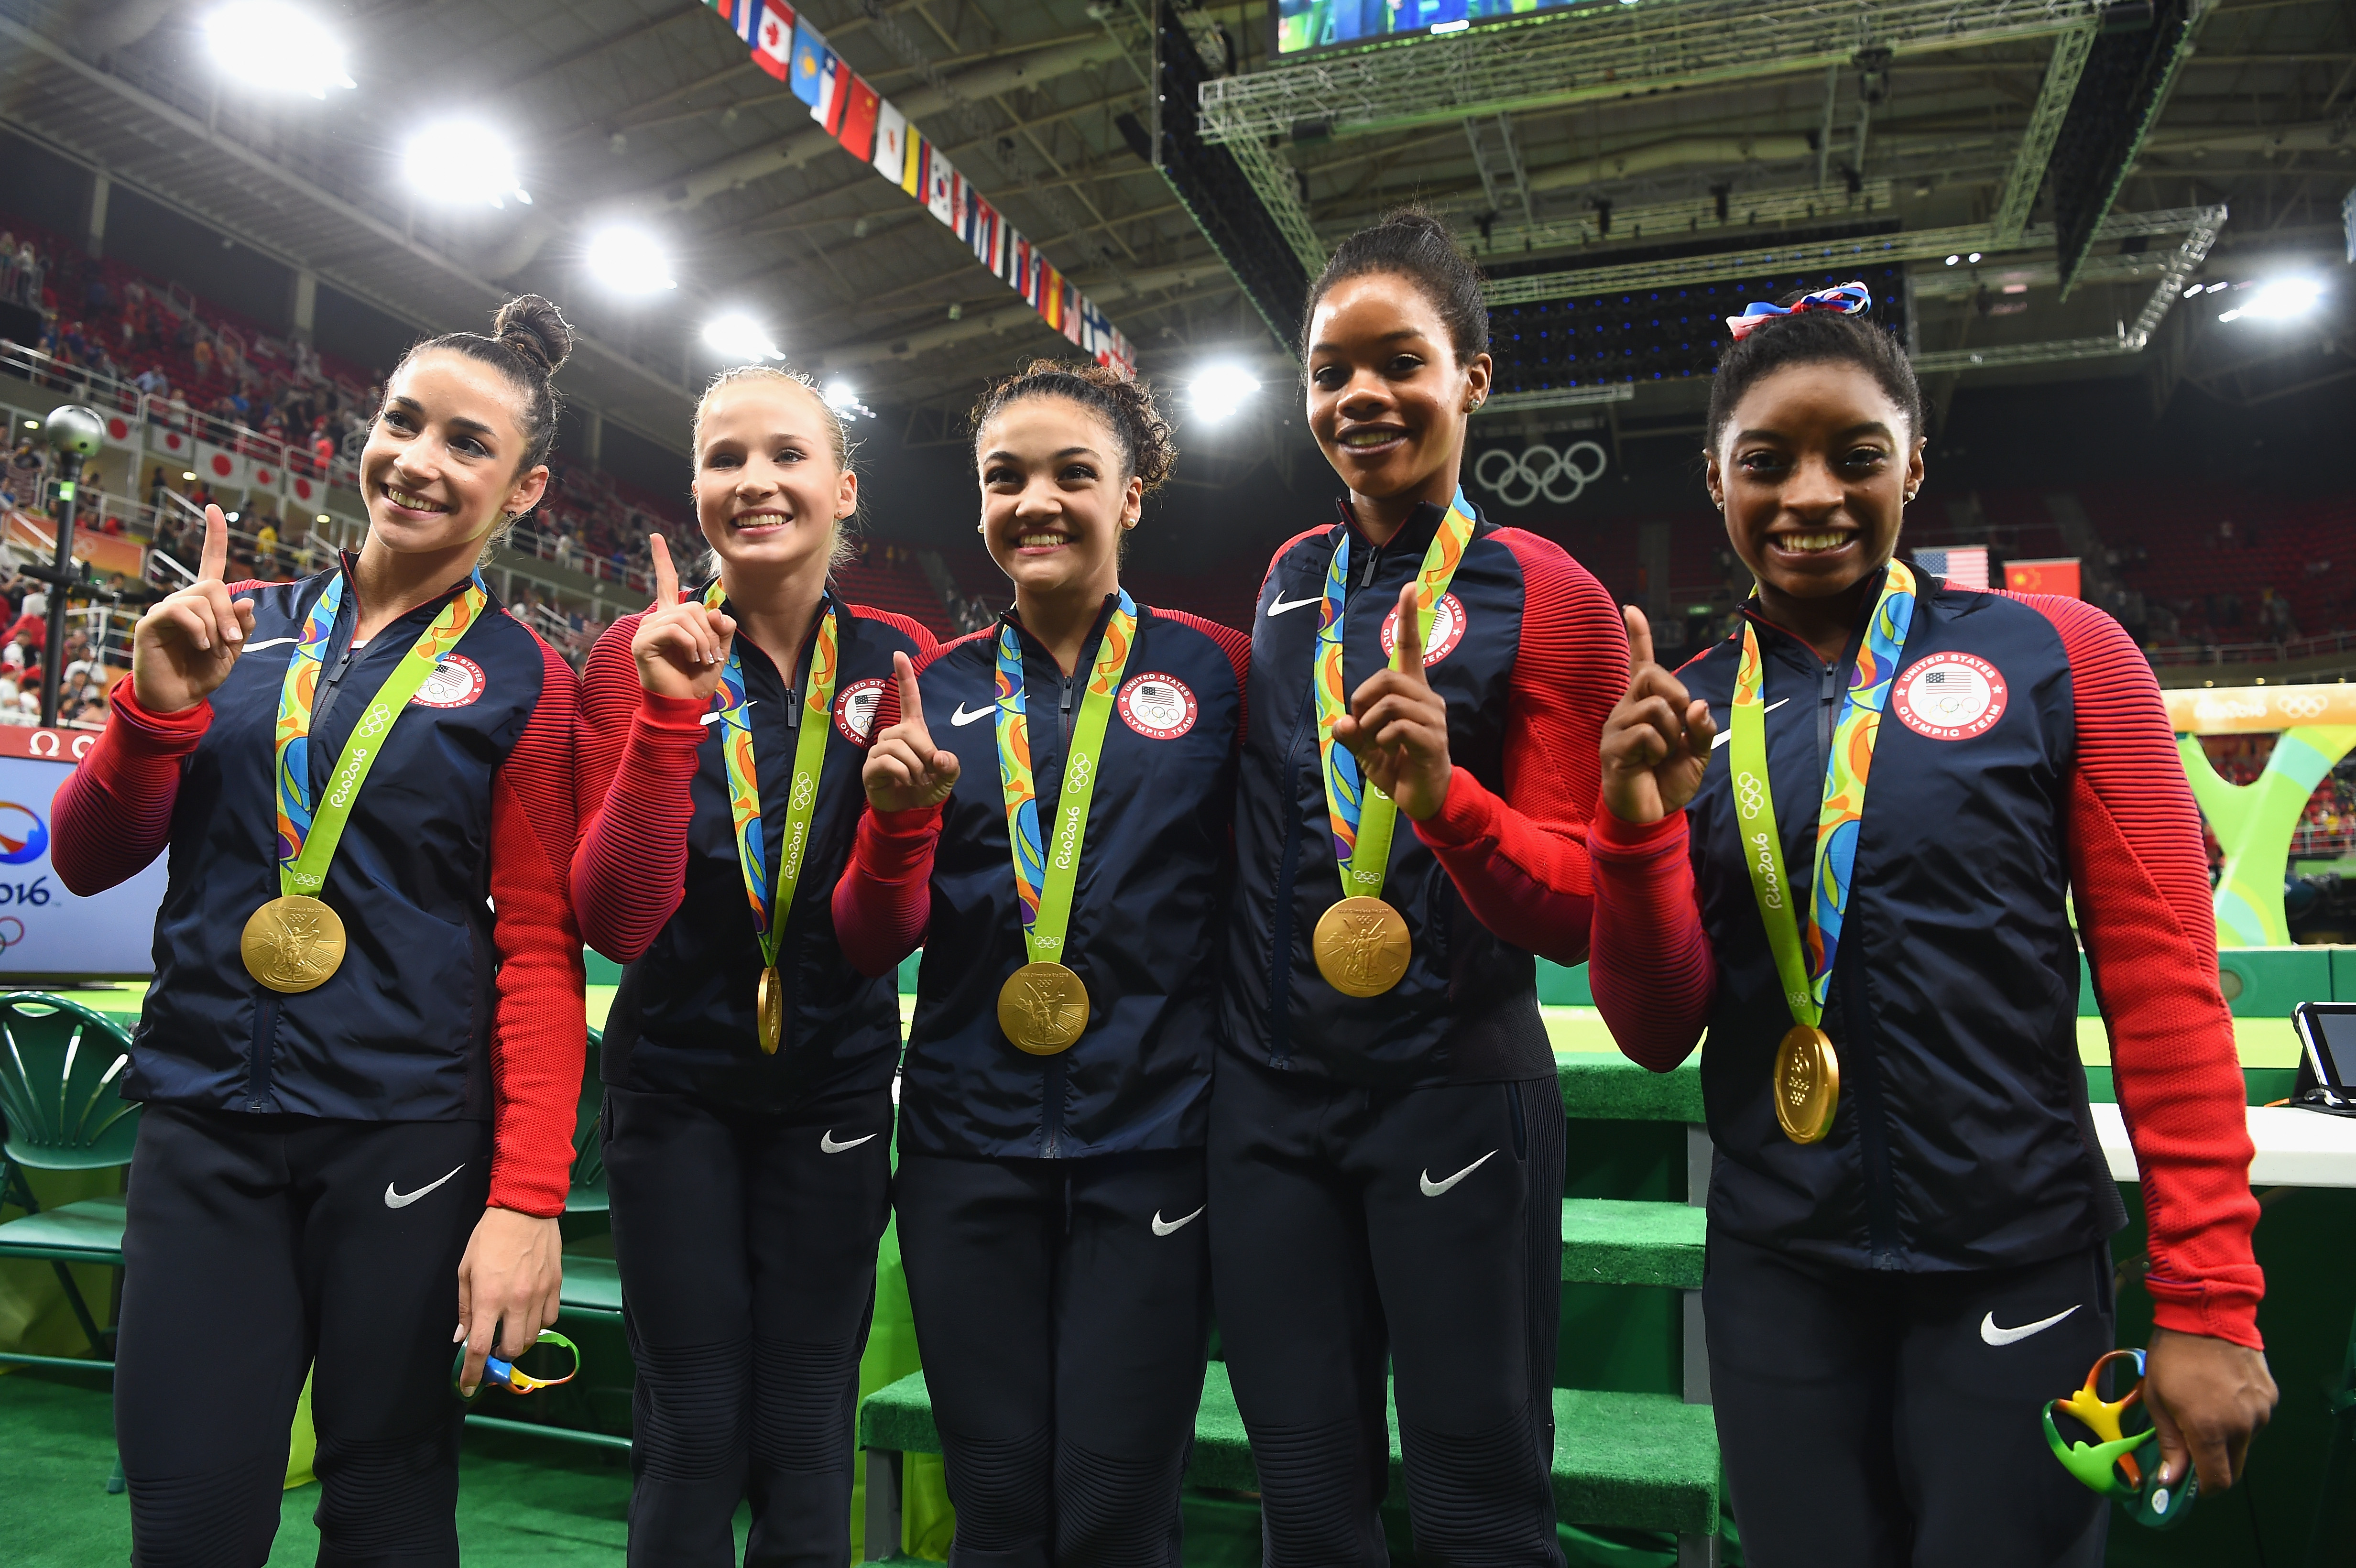 Rio 2016: the US women's gymnastics team's sheer domination, explained